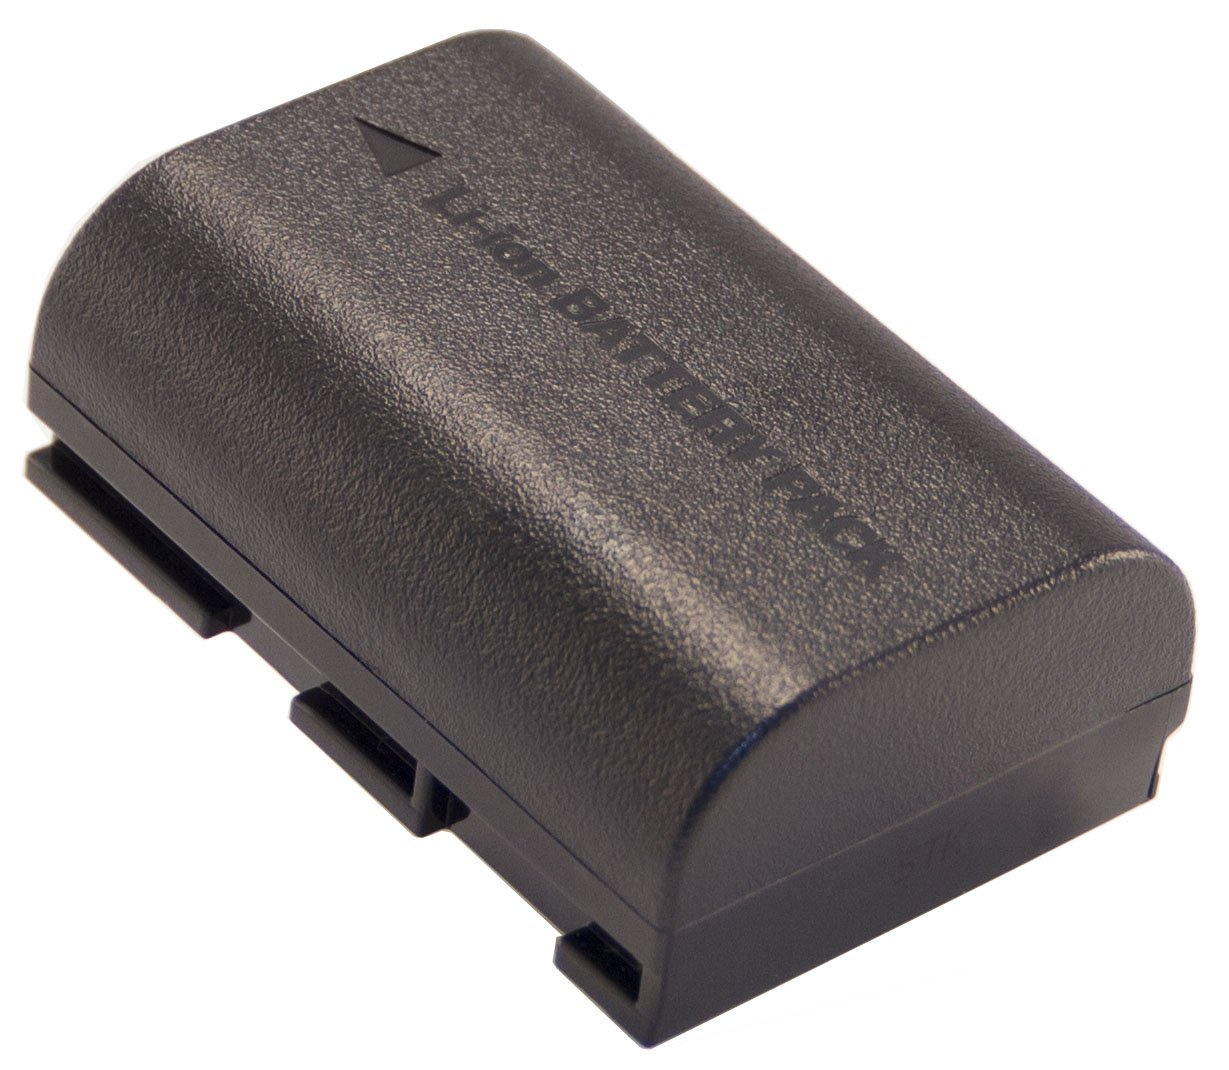 Bateria Lp-e6 Para Canon 5d Mark Ii Iii Y Iv 70d 5d 60d